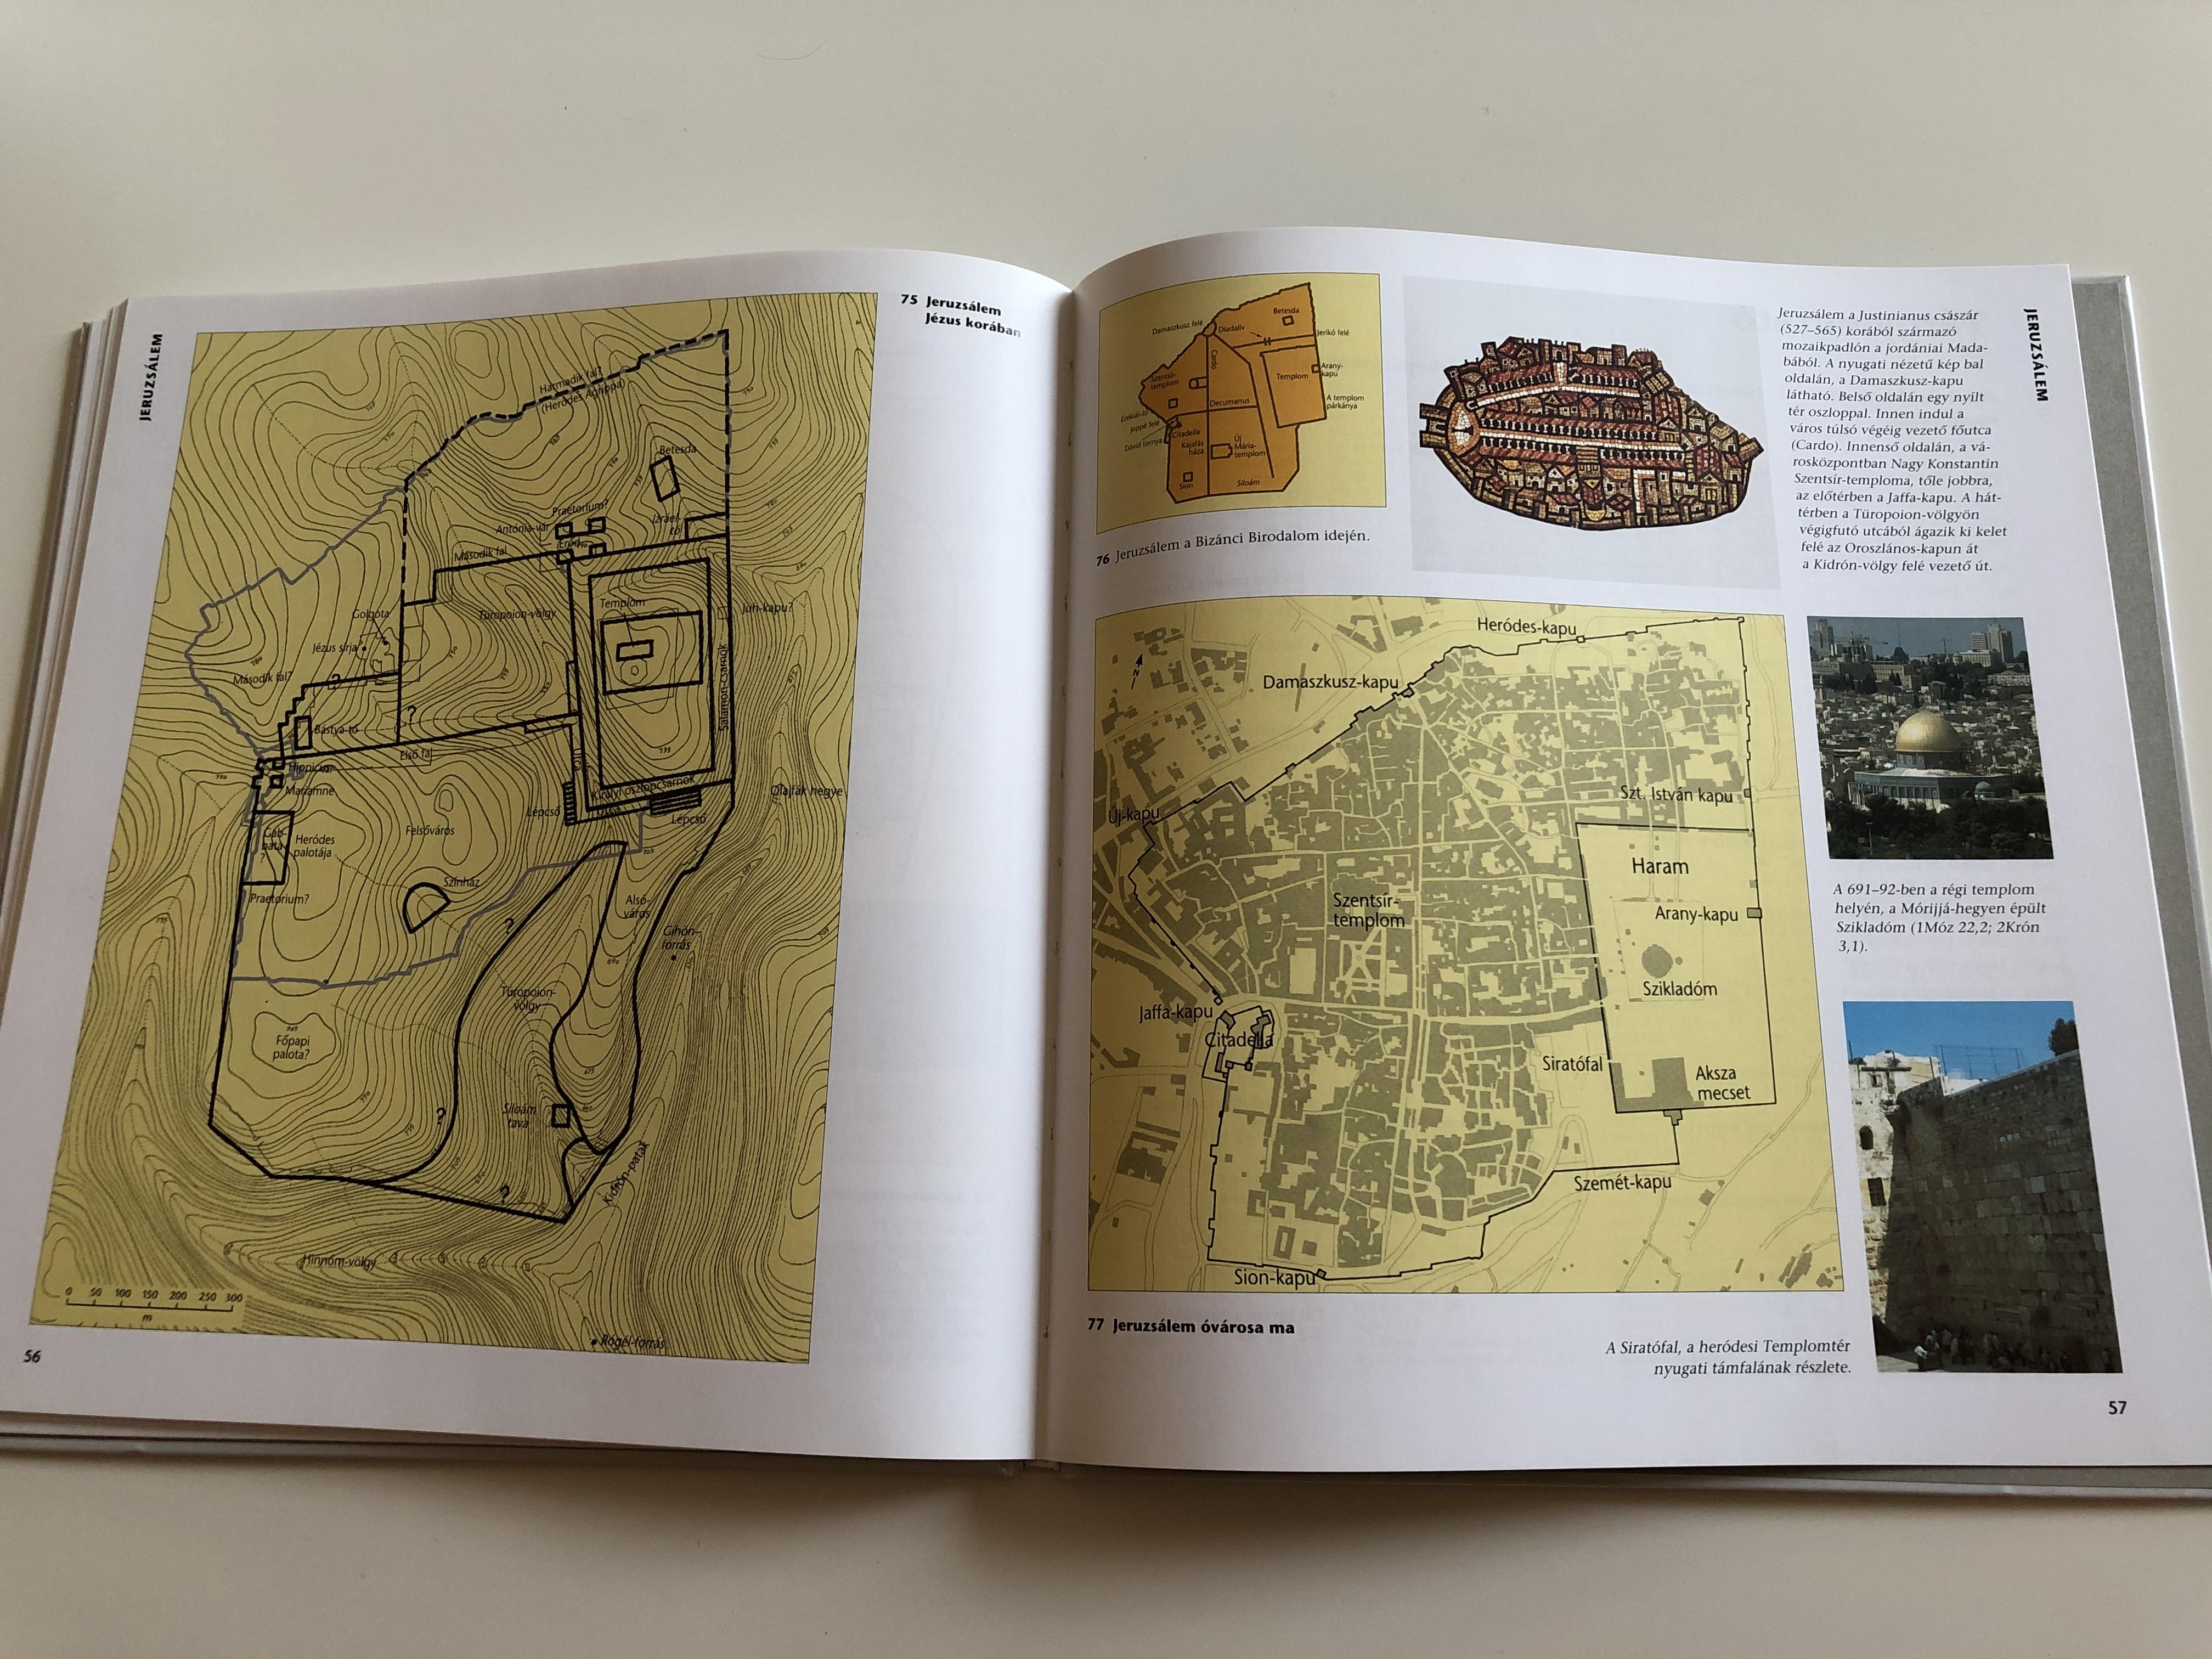 bibliai-atlasz-by-john-strange-hungarian-language-bible-atlas-14.jpg